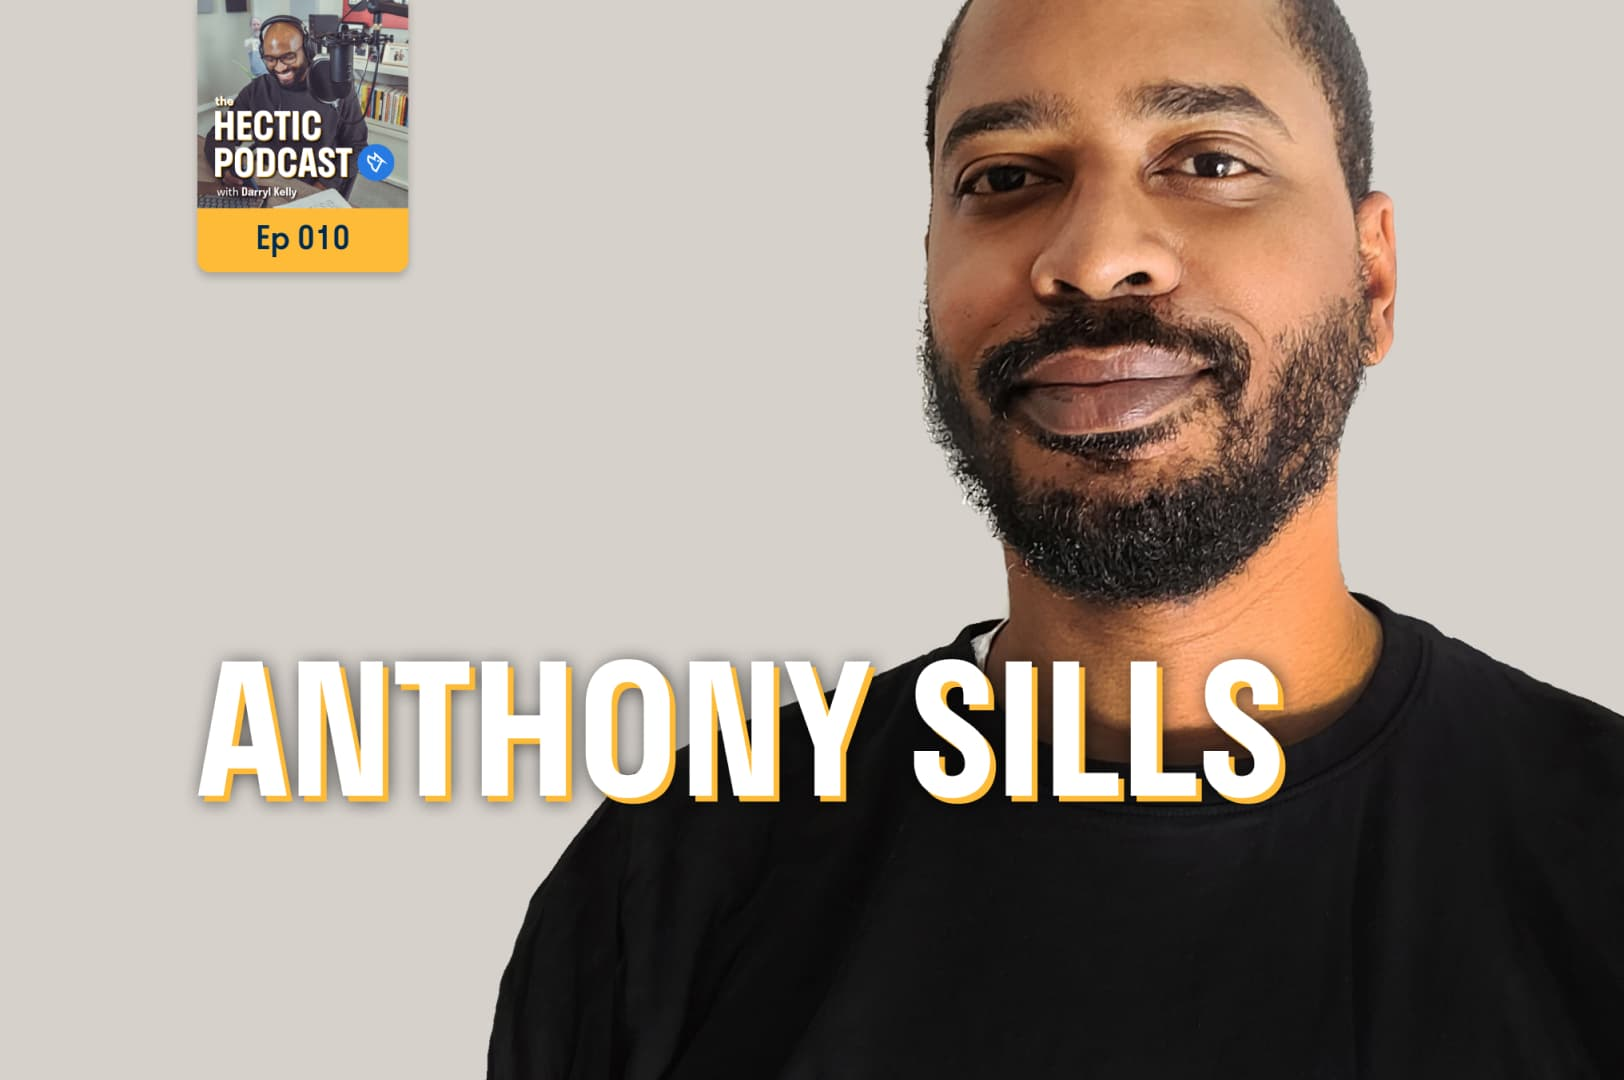 Anthony Sills